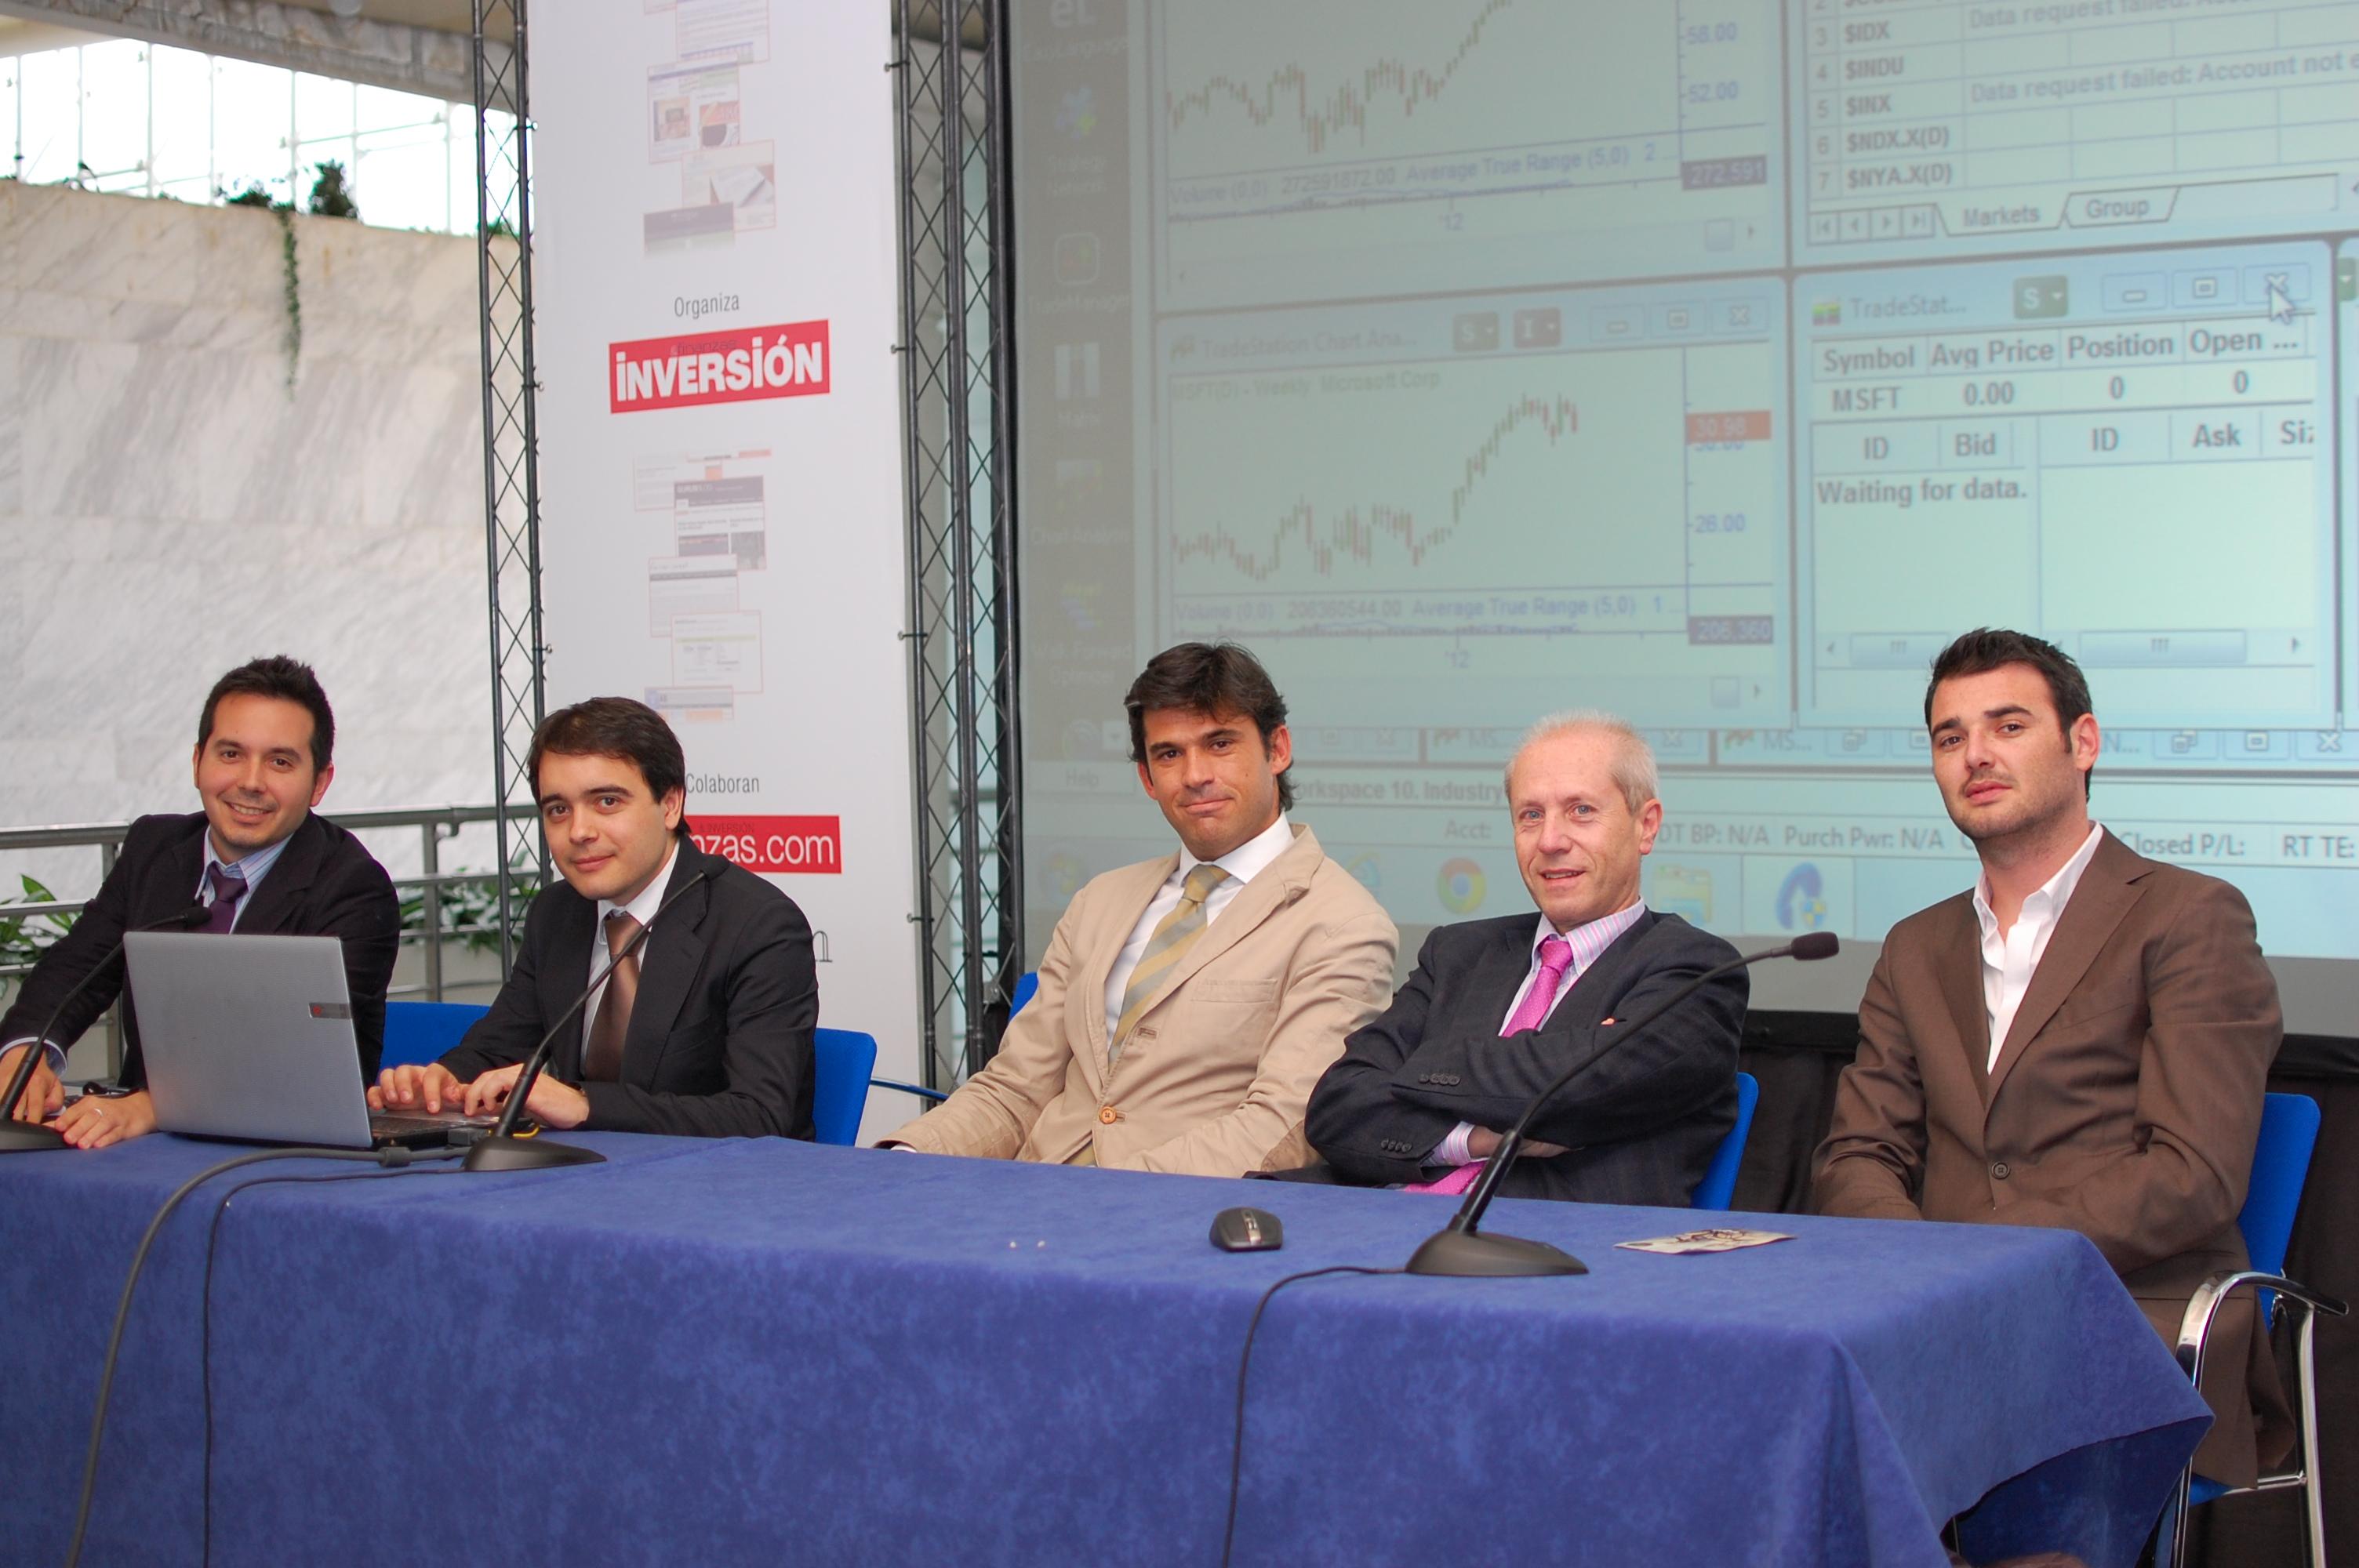 Javier Alfayate, MarcRibes, José Luis García, Luis Ortiz de Zárate, Andrés Jiménez